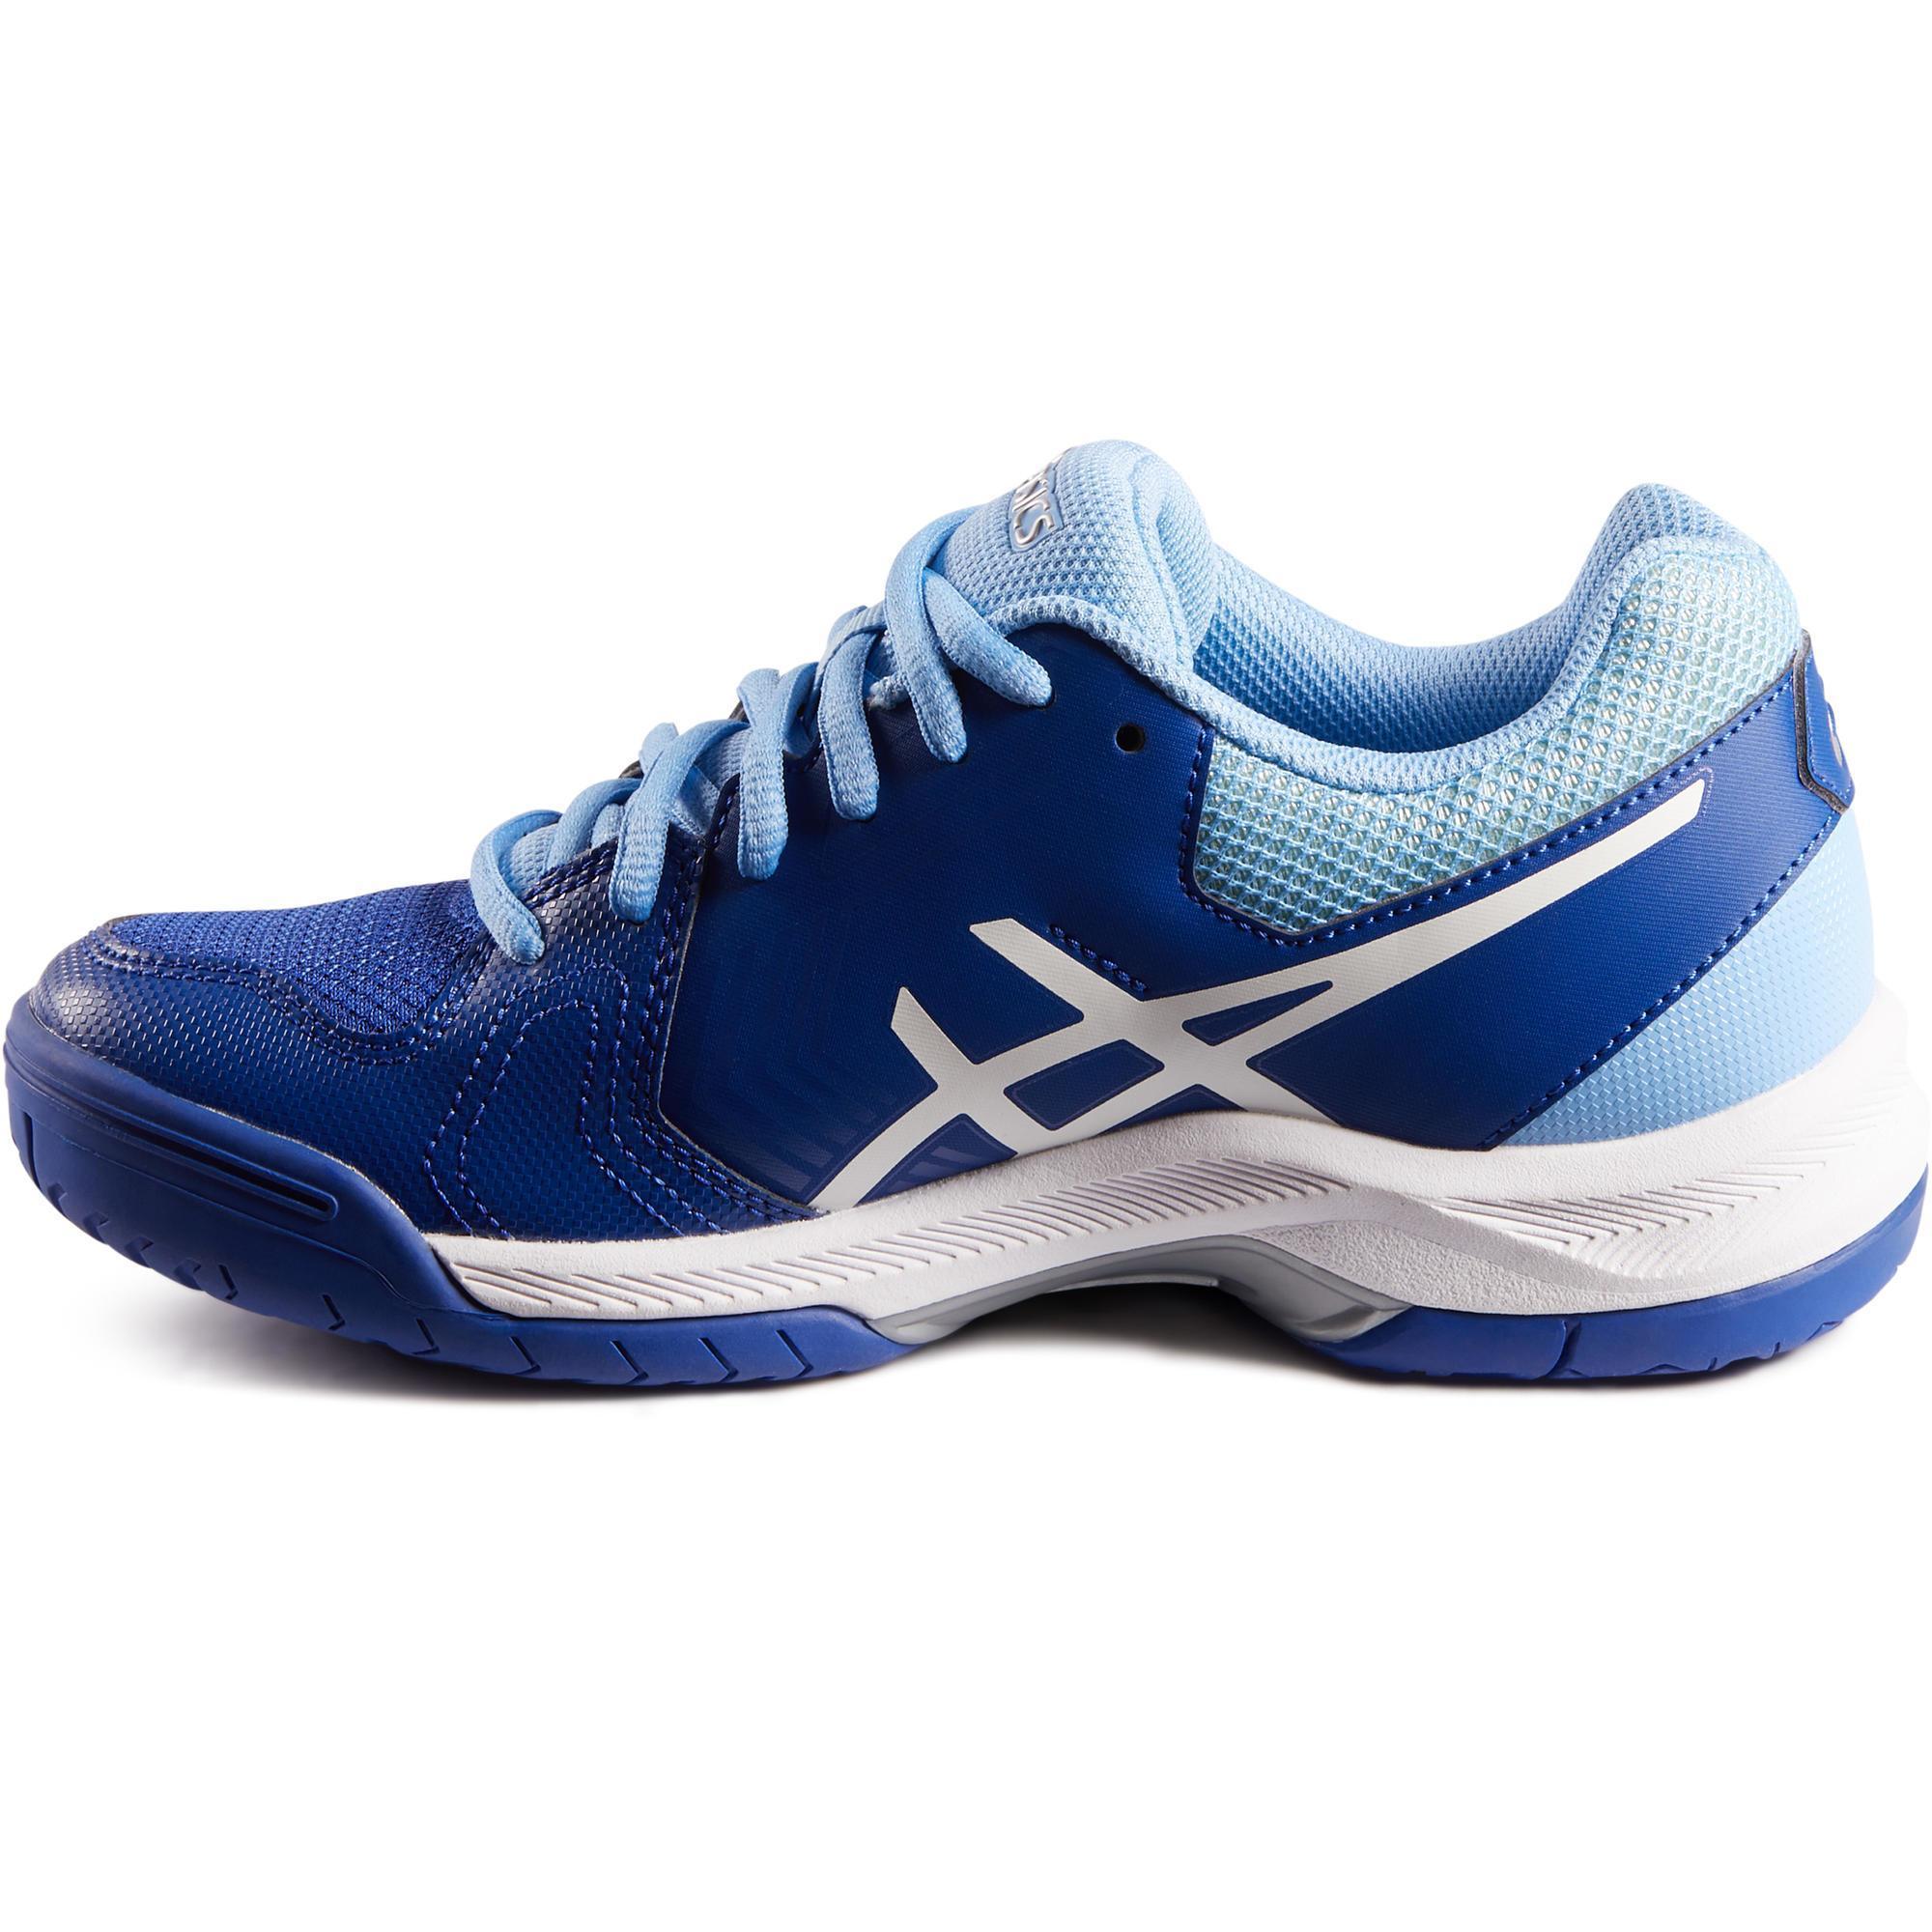 f85b6a23b31b Bleue Dedicate Femme Chaussure Gel Decathlon Asics De Tennis CYPwnXq ...